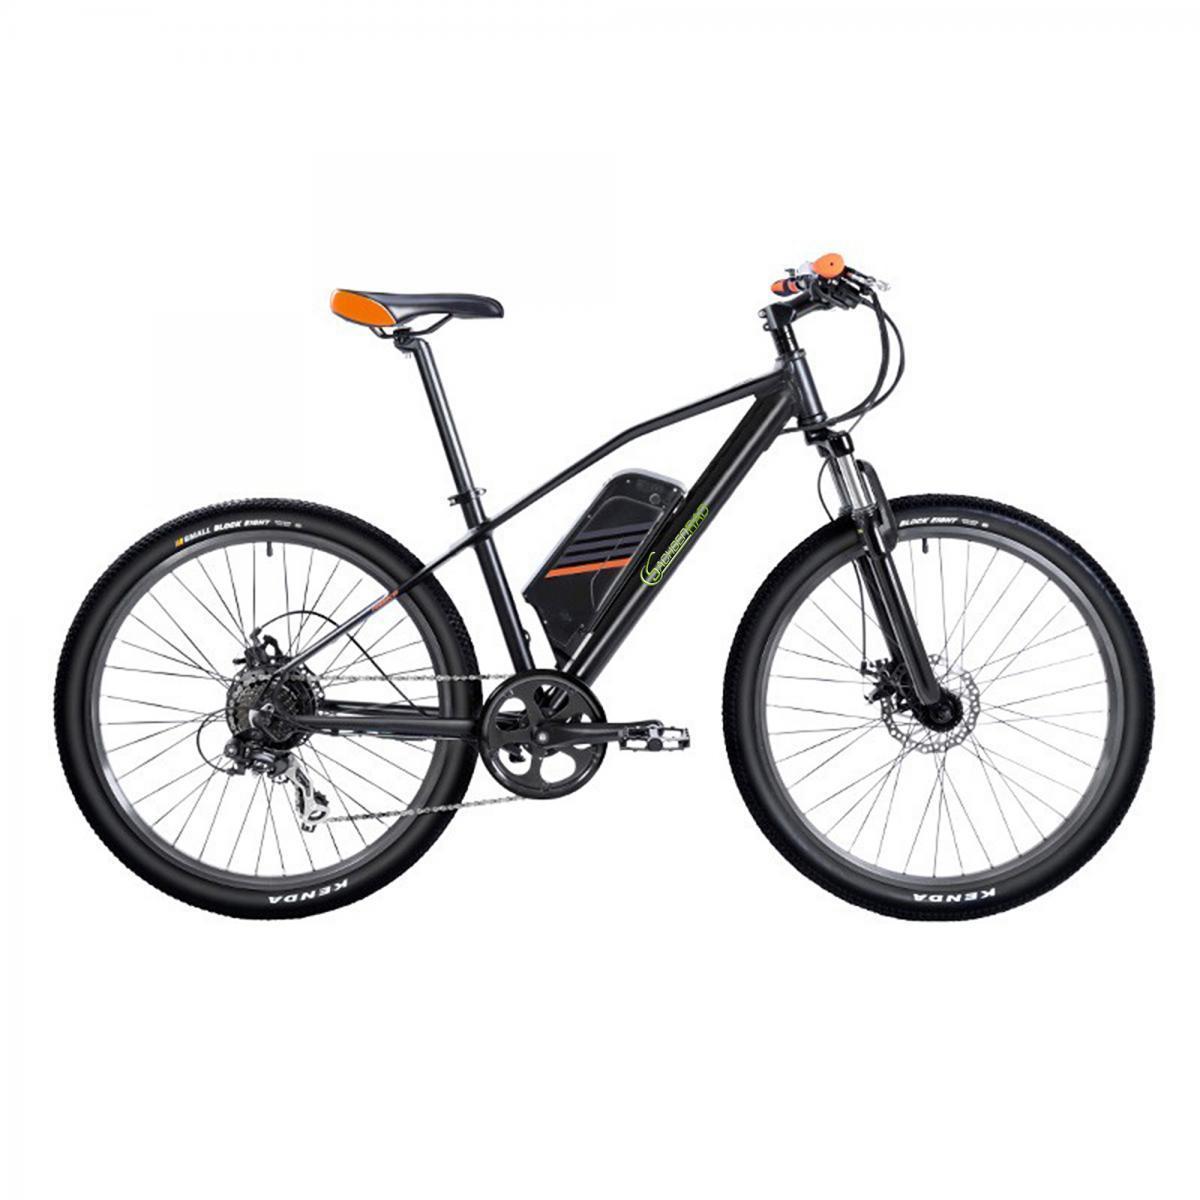 Bild 1 von SachsenRad E-Racing Bike R6